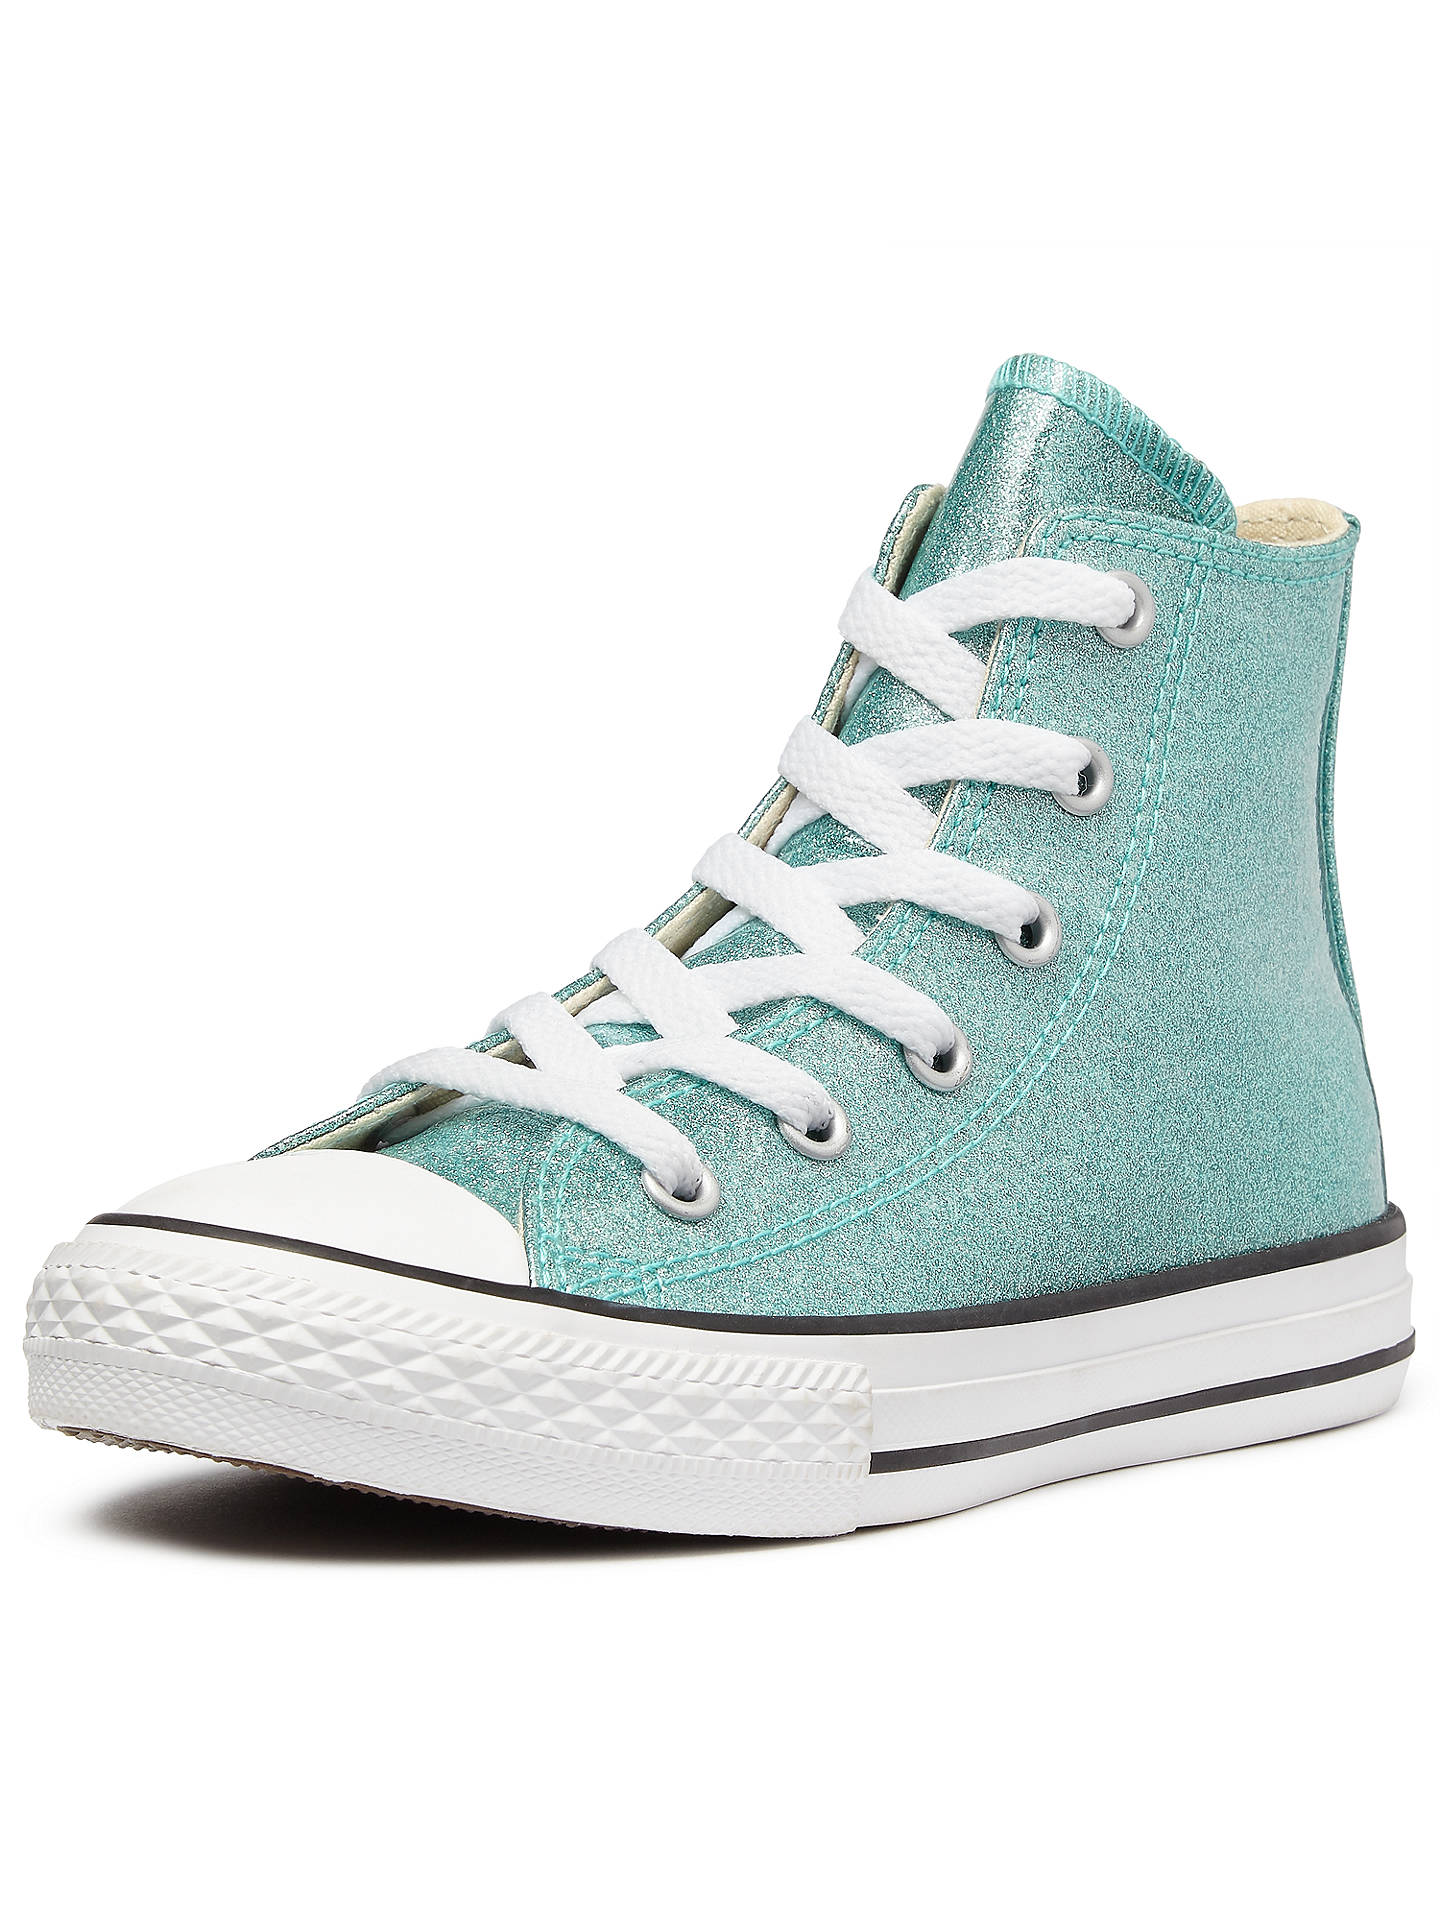 0a1359de09a0 ... Buy Converse Children s Chuck Taylor All Star Hi-Top Glitter Trainers